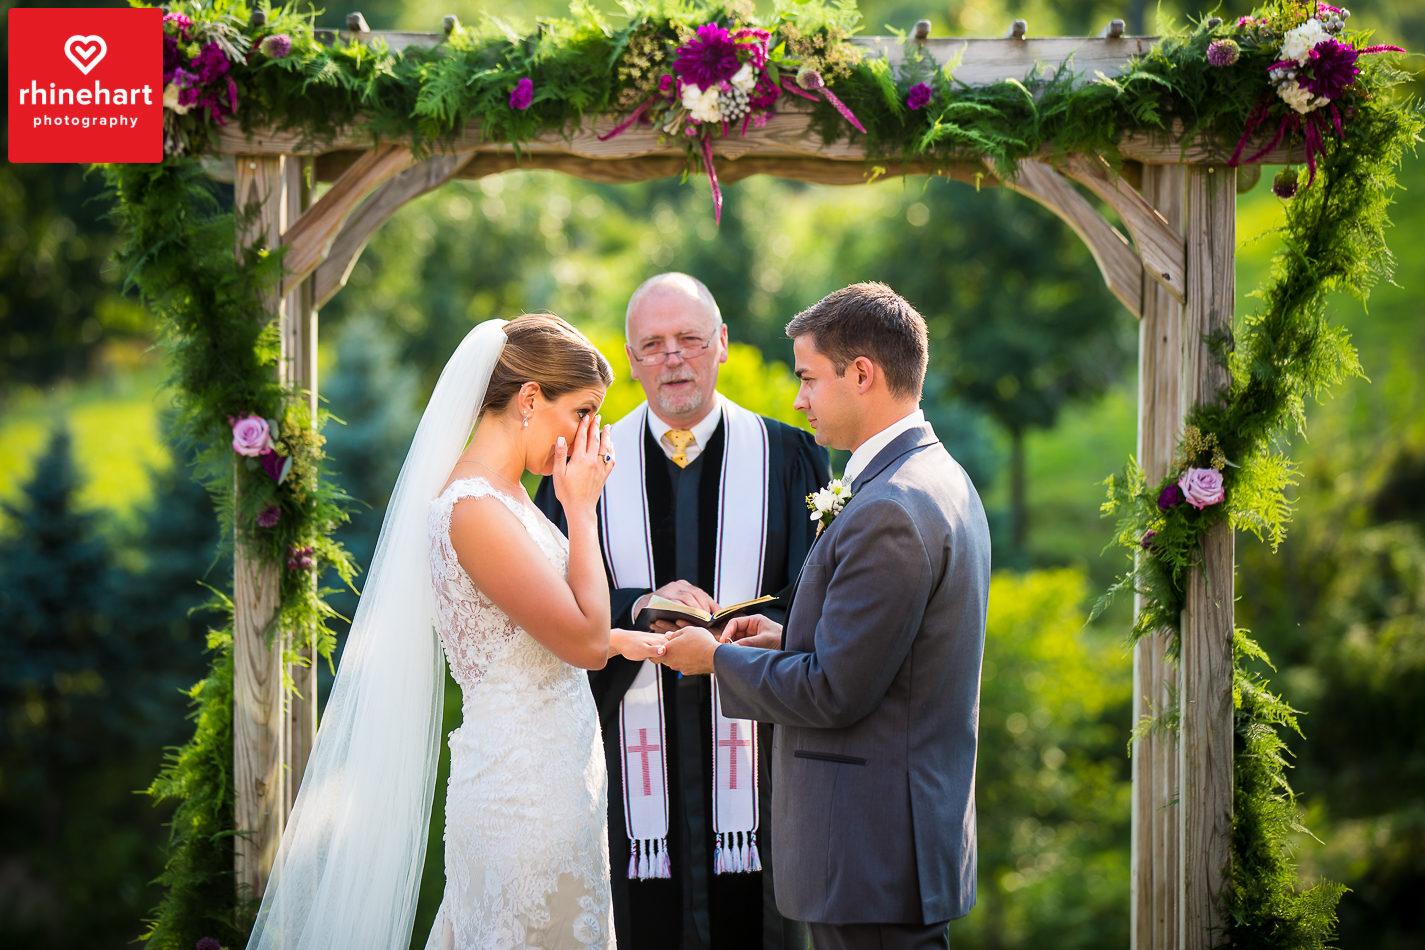 glasbern-inn-wedding-photographer-226